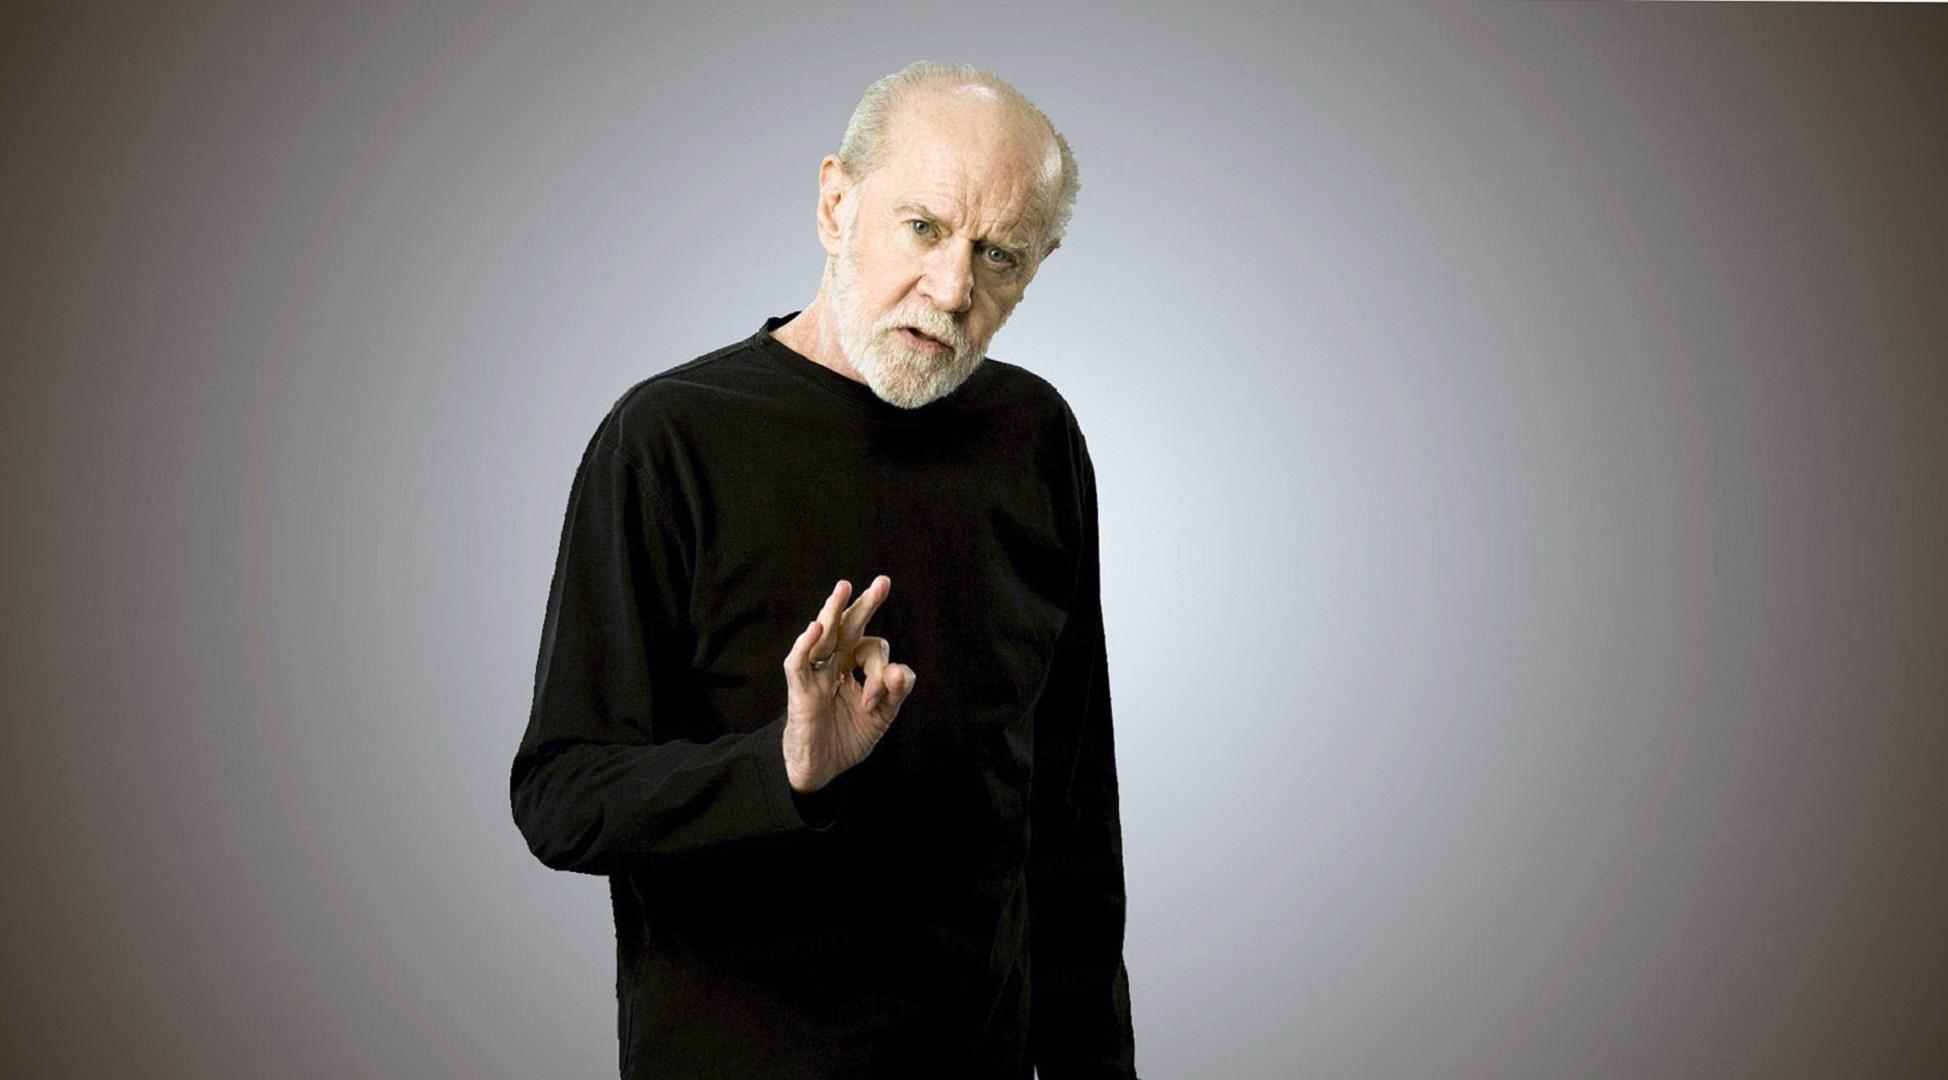 George Carlin Computer Wallpaper